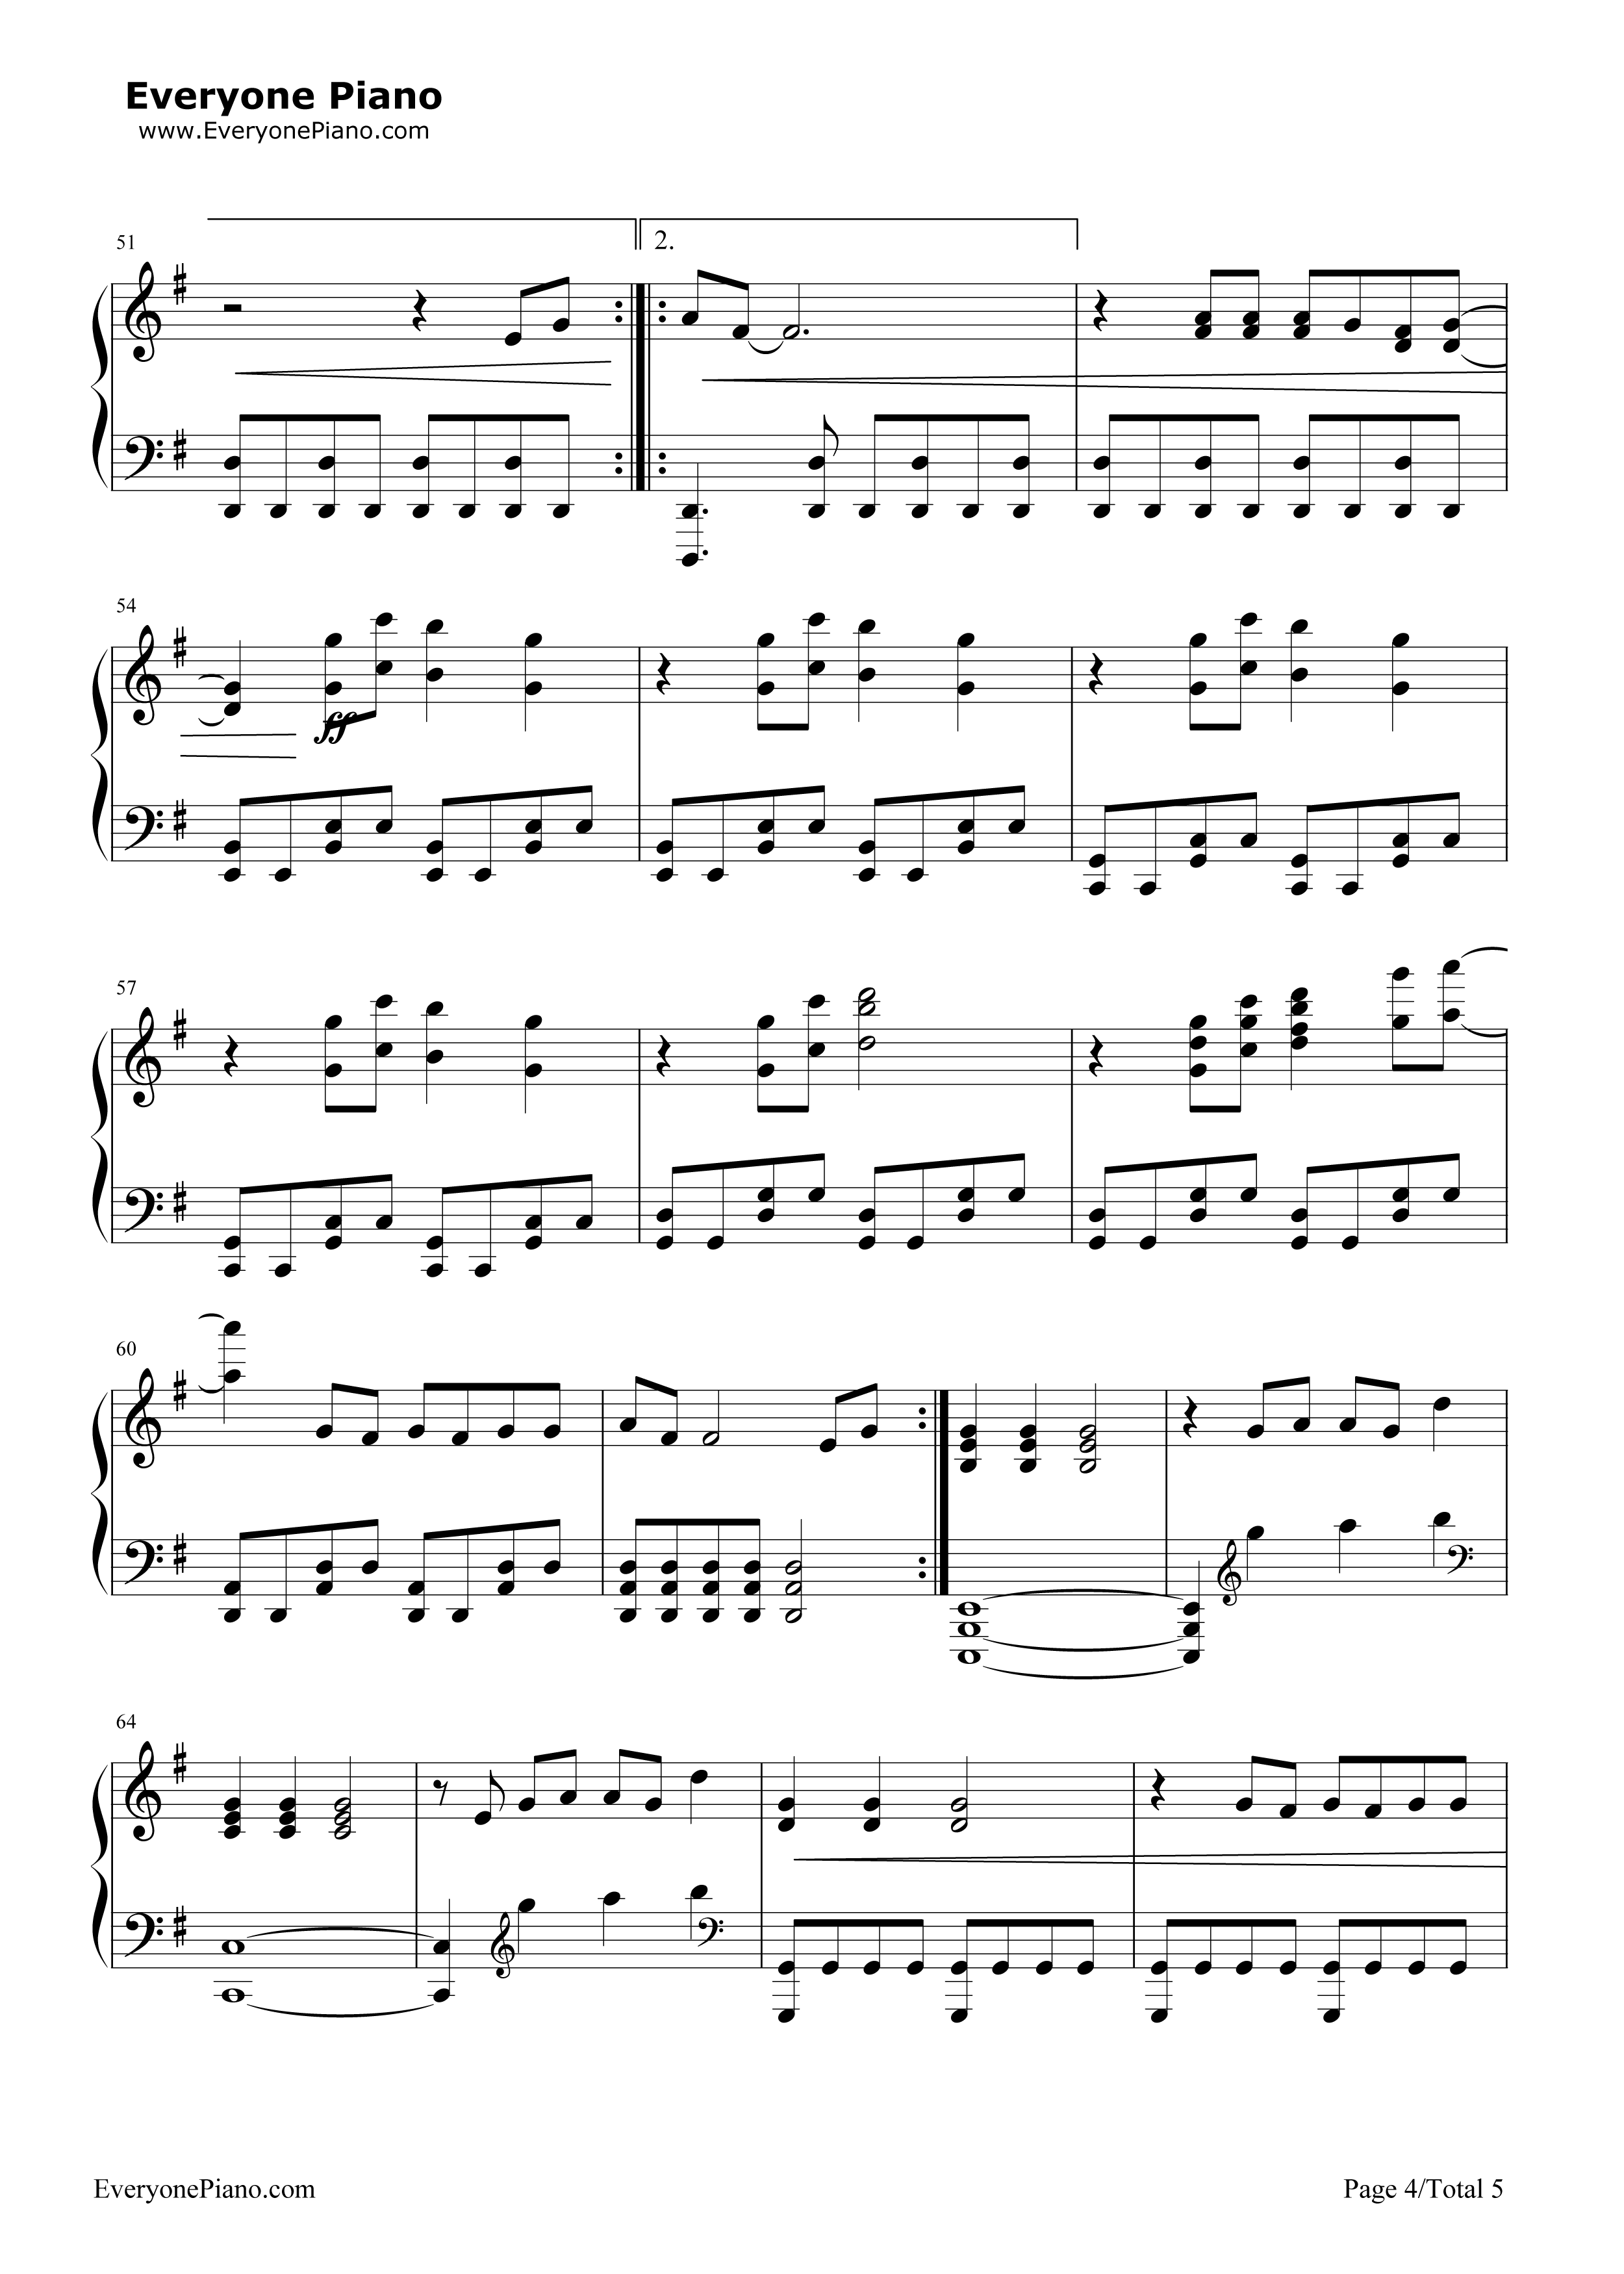 skinny love sheet music free pdf